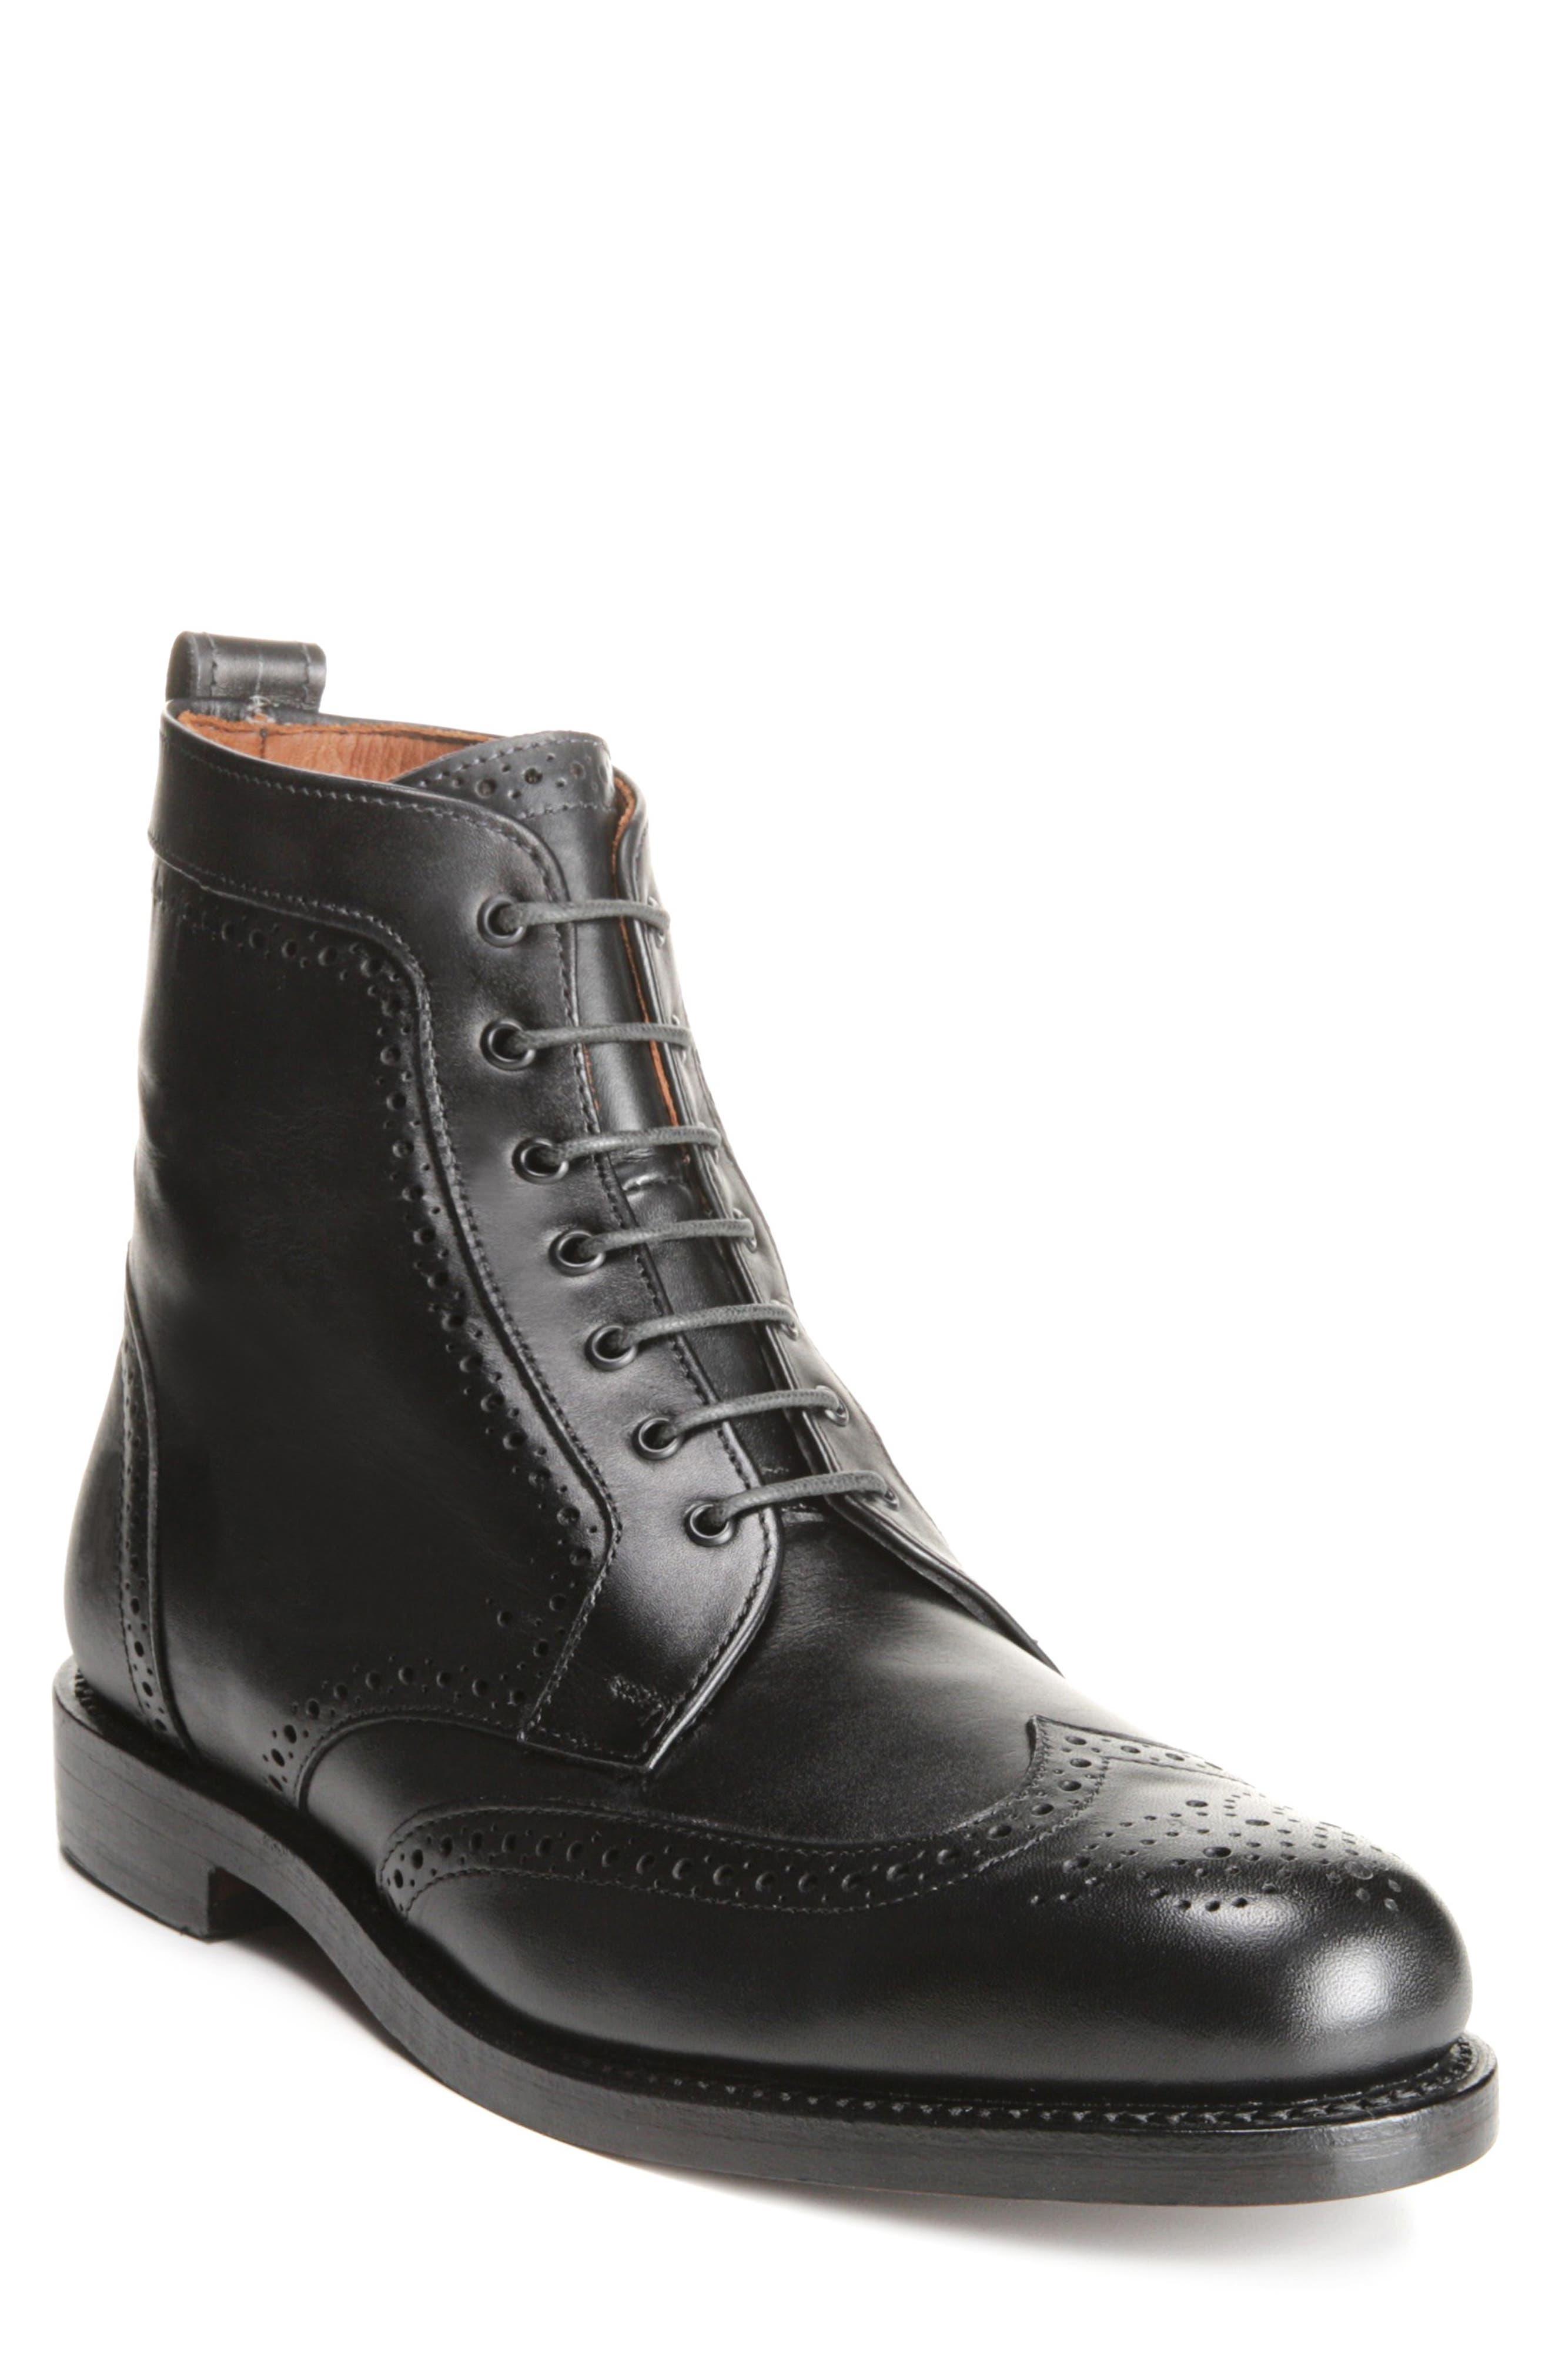 60aeaf4fa25 Mens Dress Boots | Nordstrom